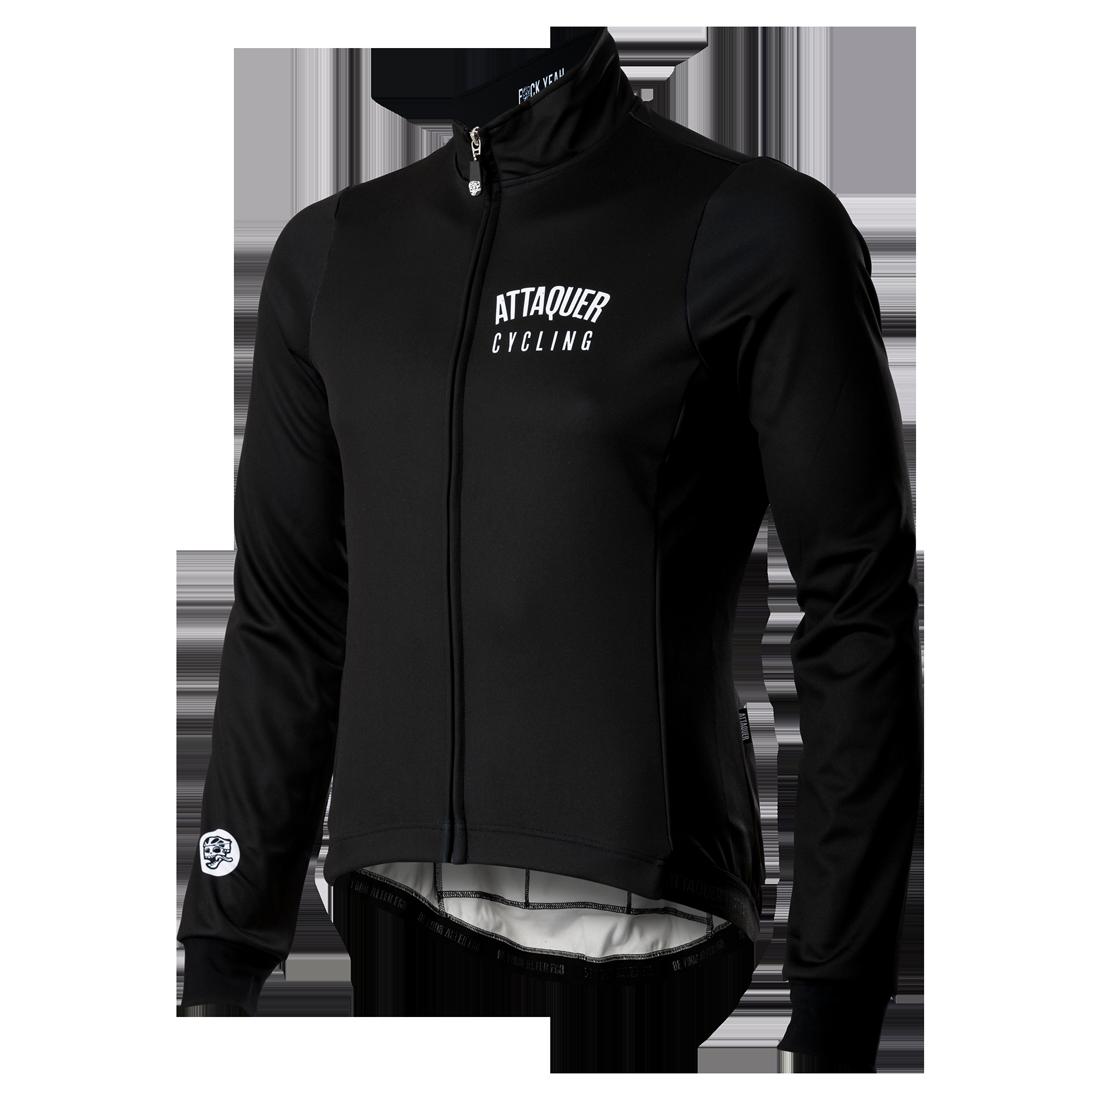 Attaquer All Day Club Jacket Black